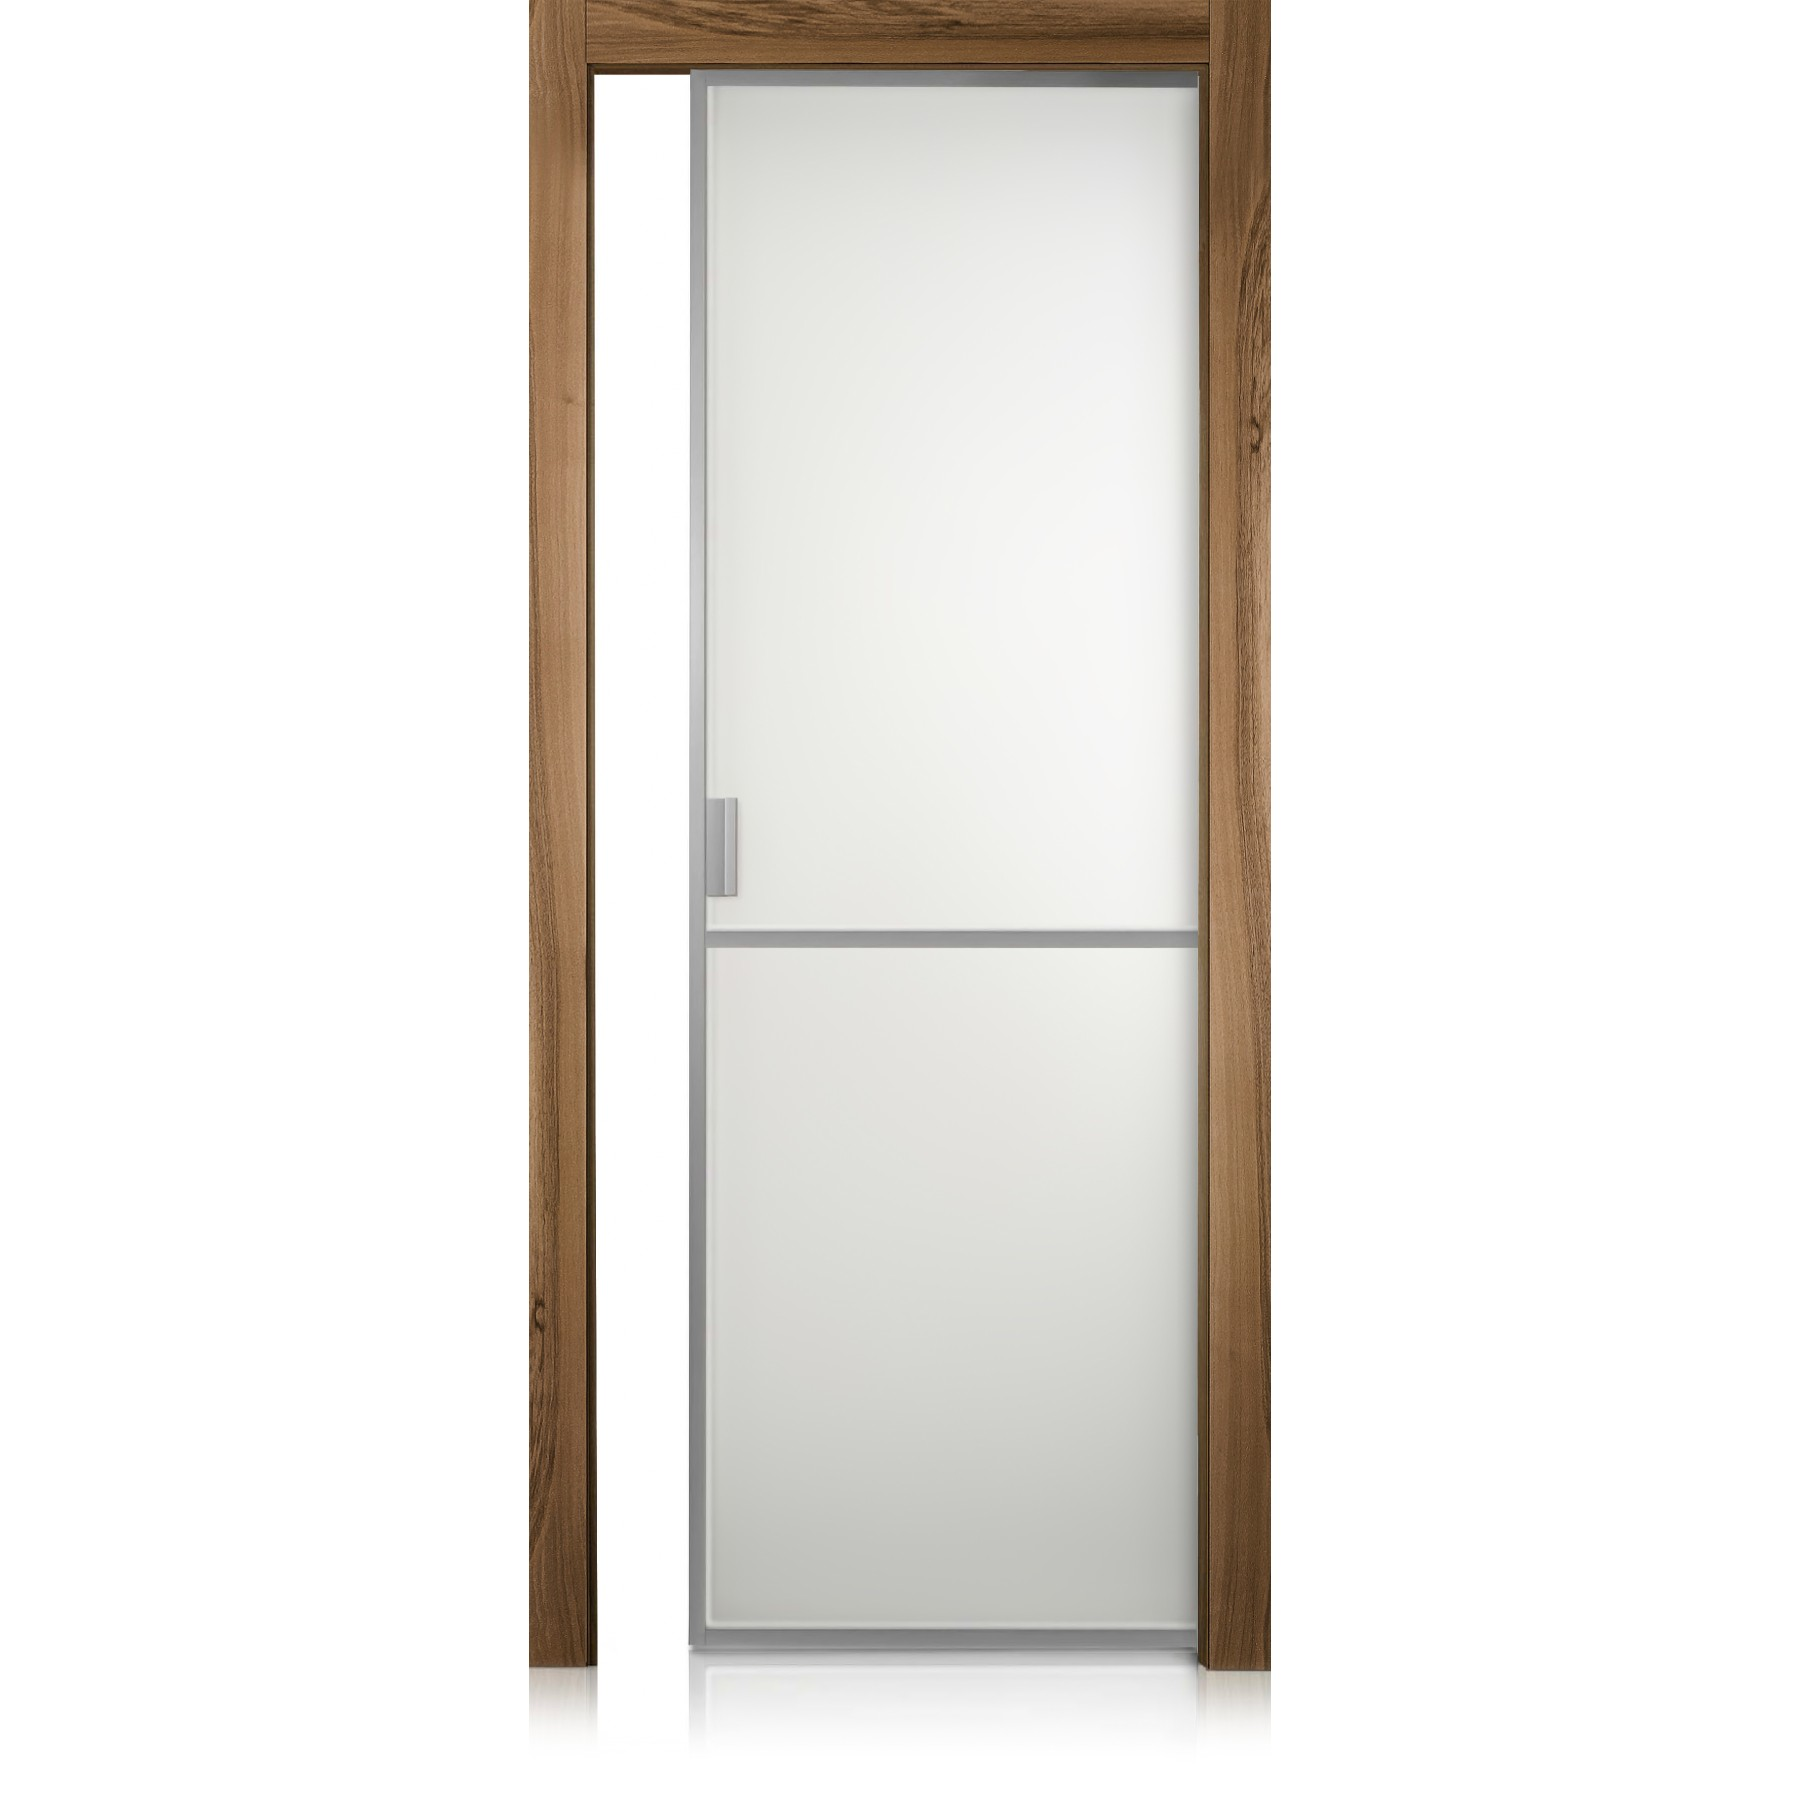 Cristal Frame / 1 noce natural touch door